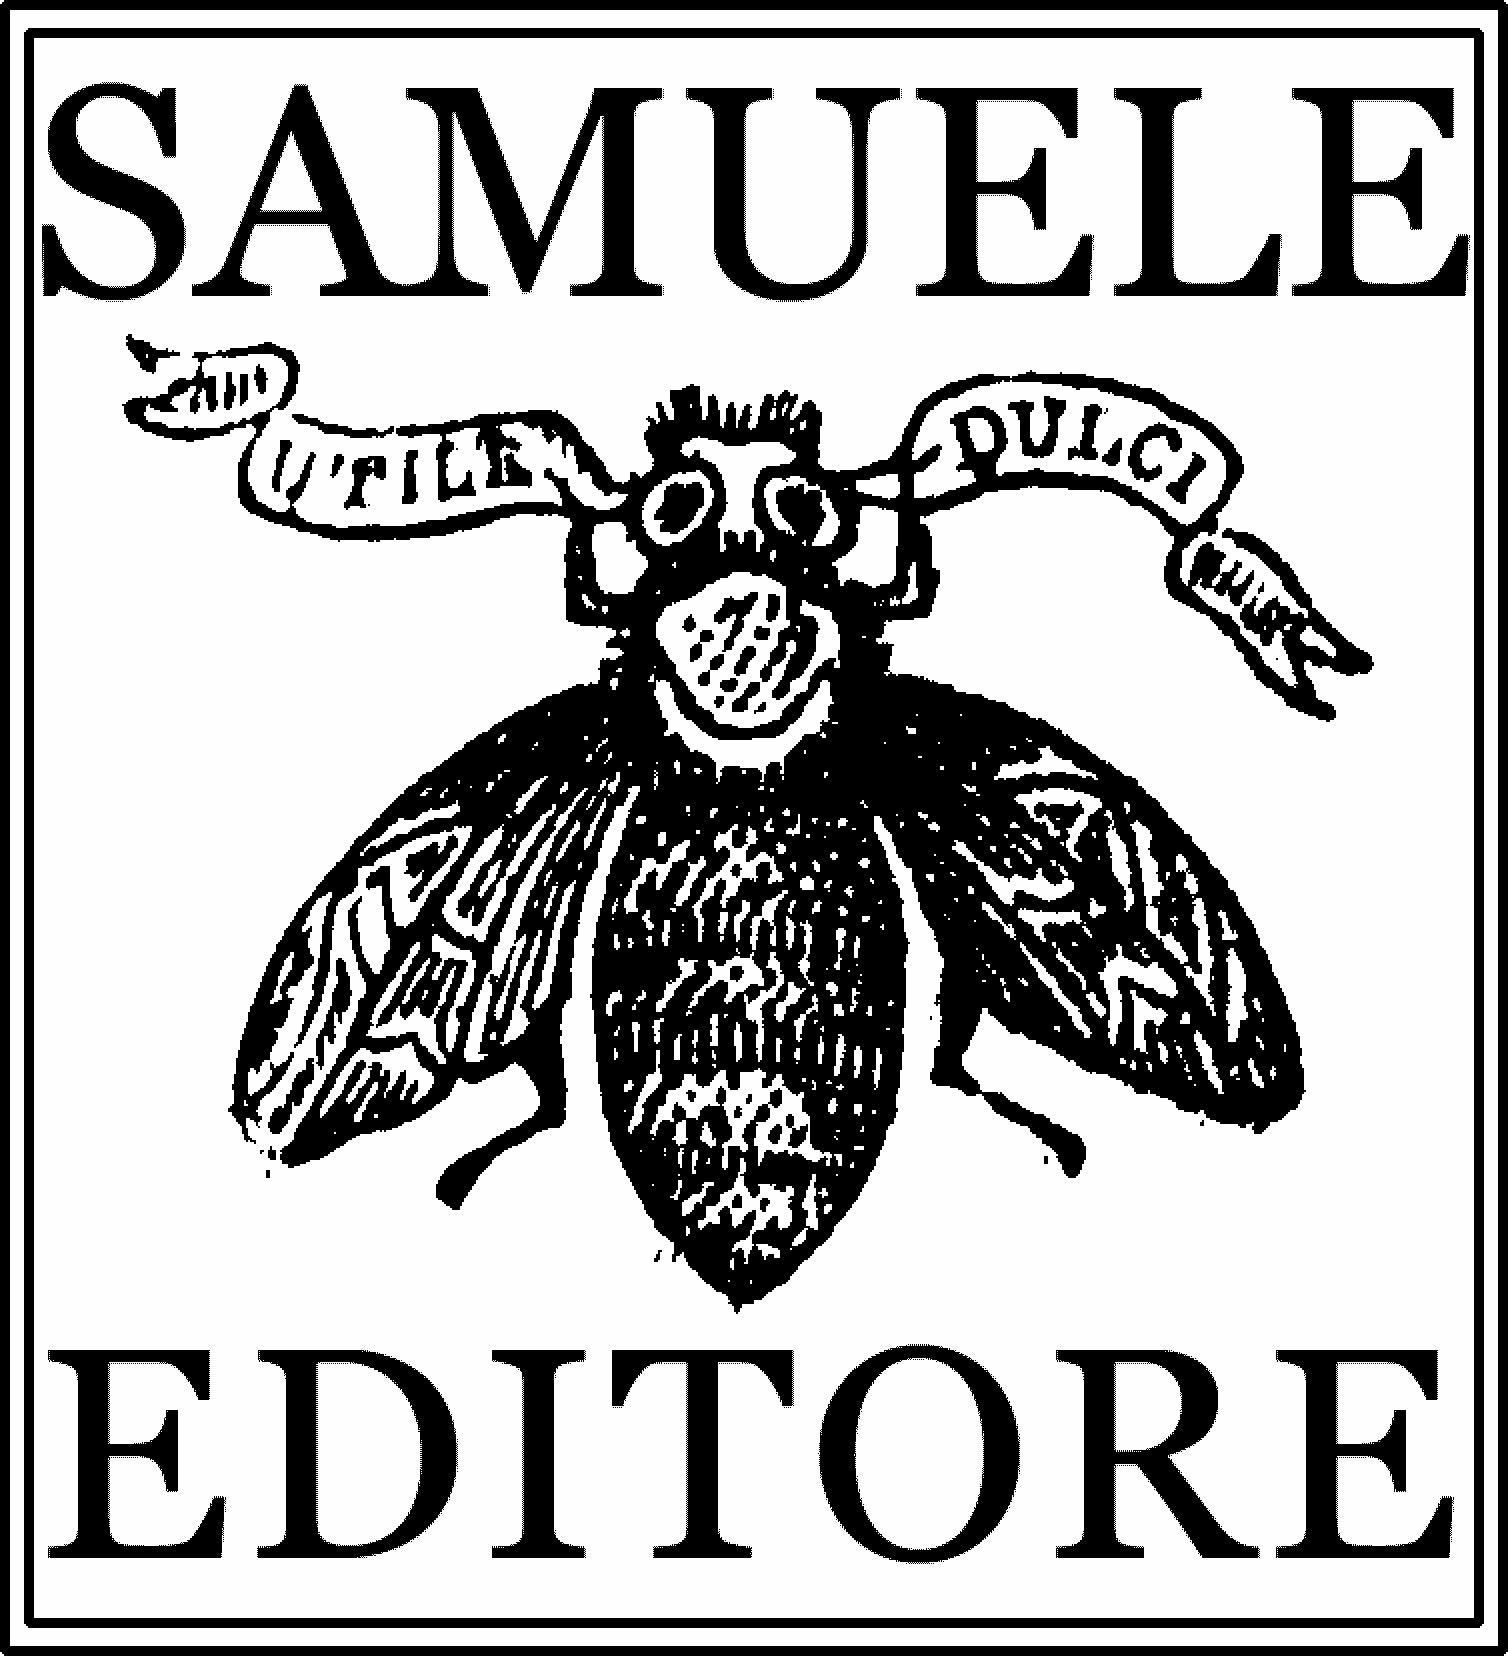 1462870344643611 logo samuele editore